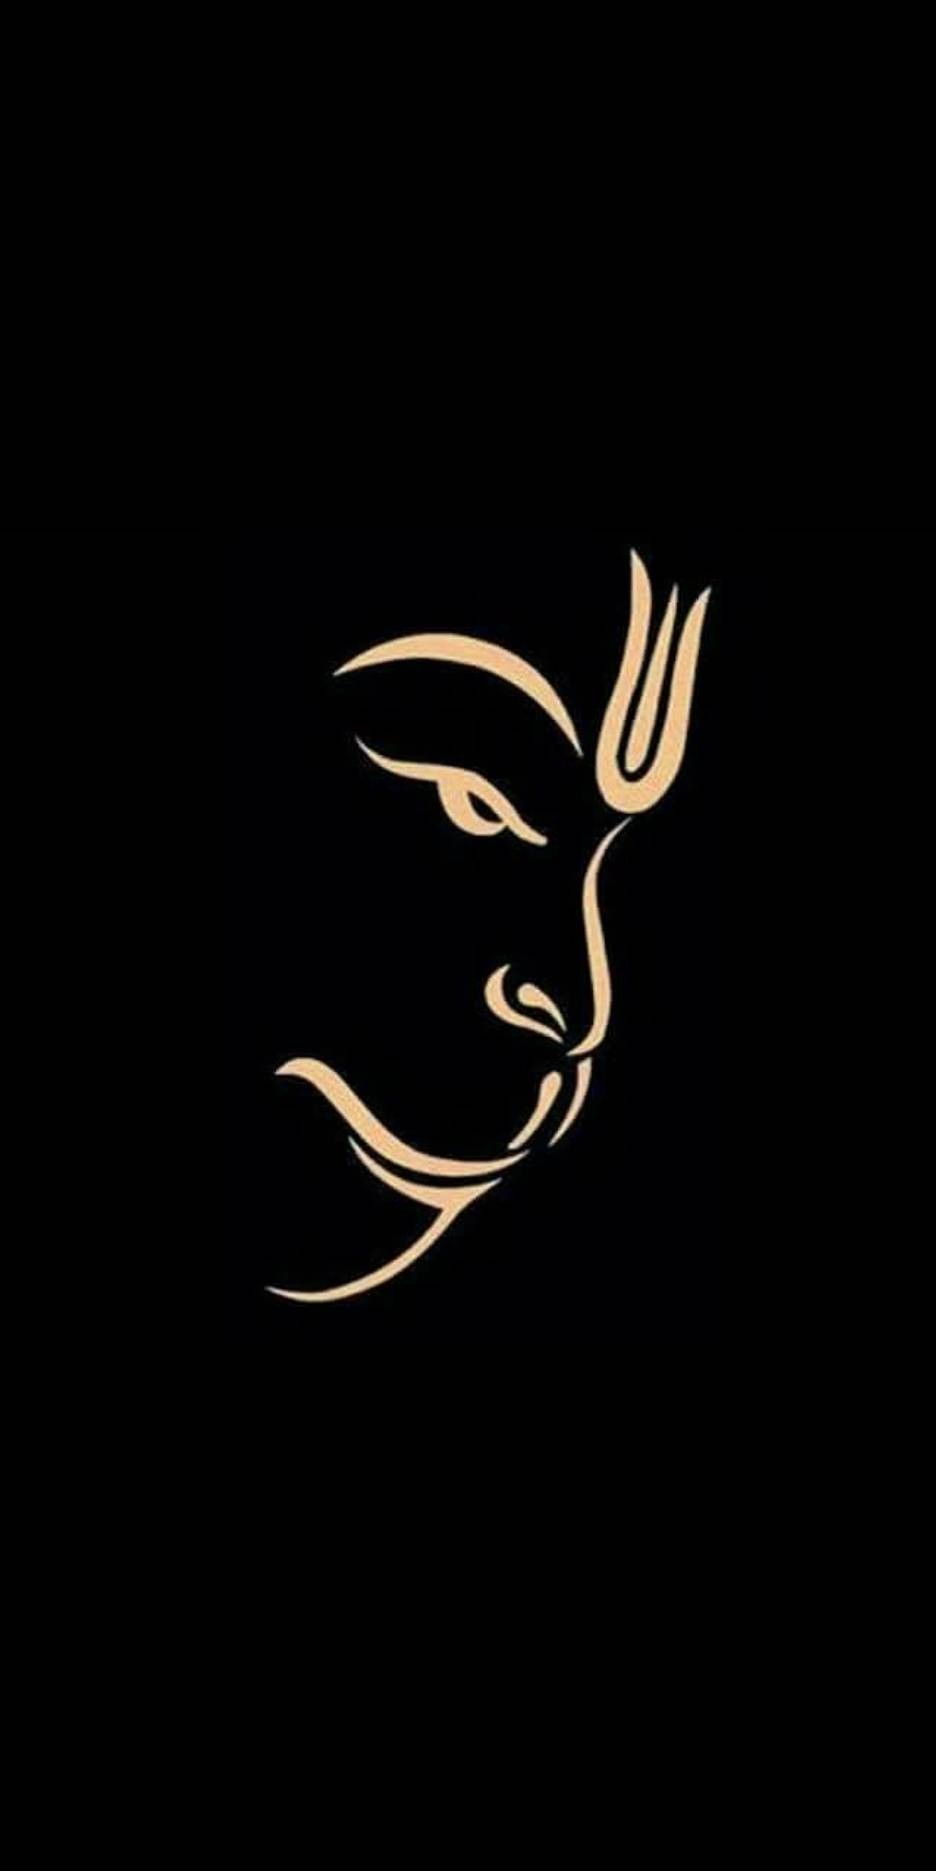 Black High Quality Hanuman Wallpaper Hd